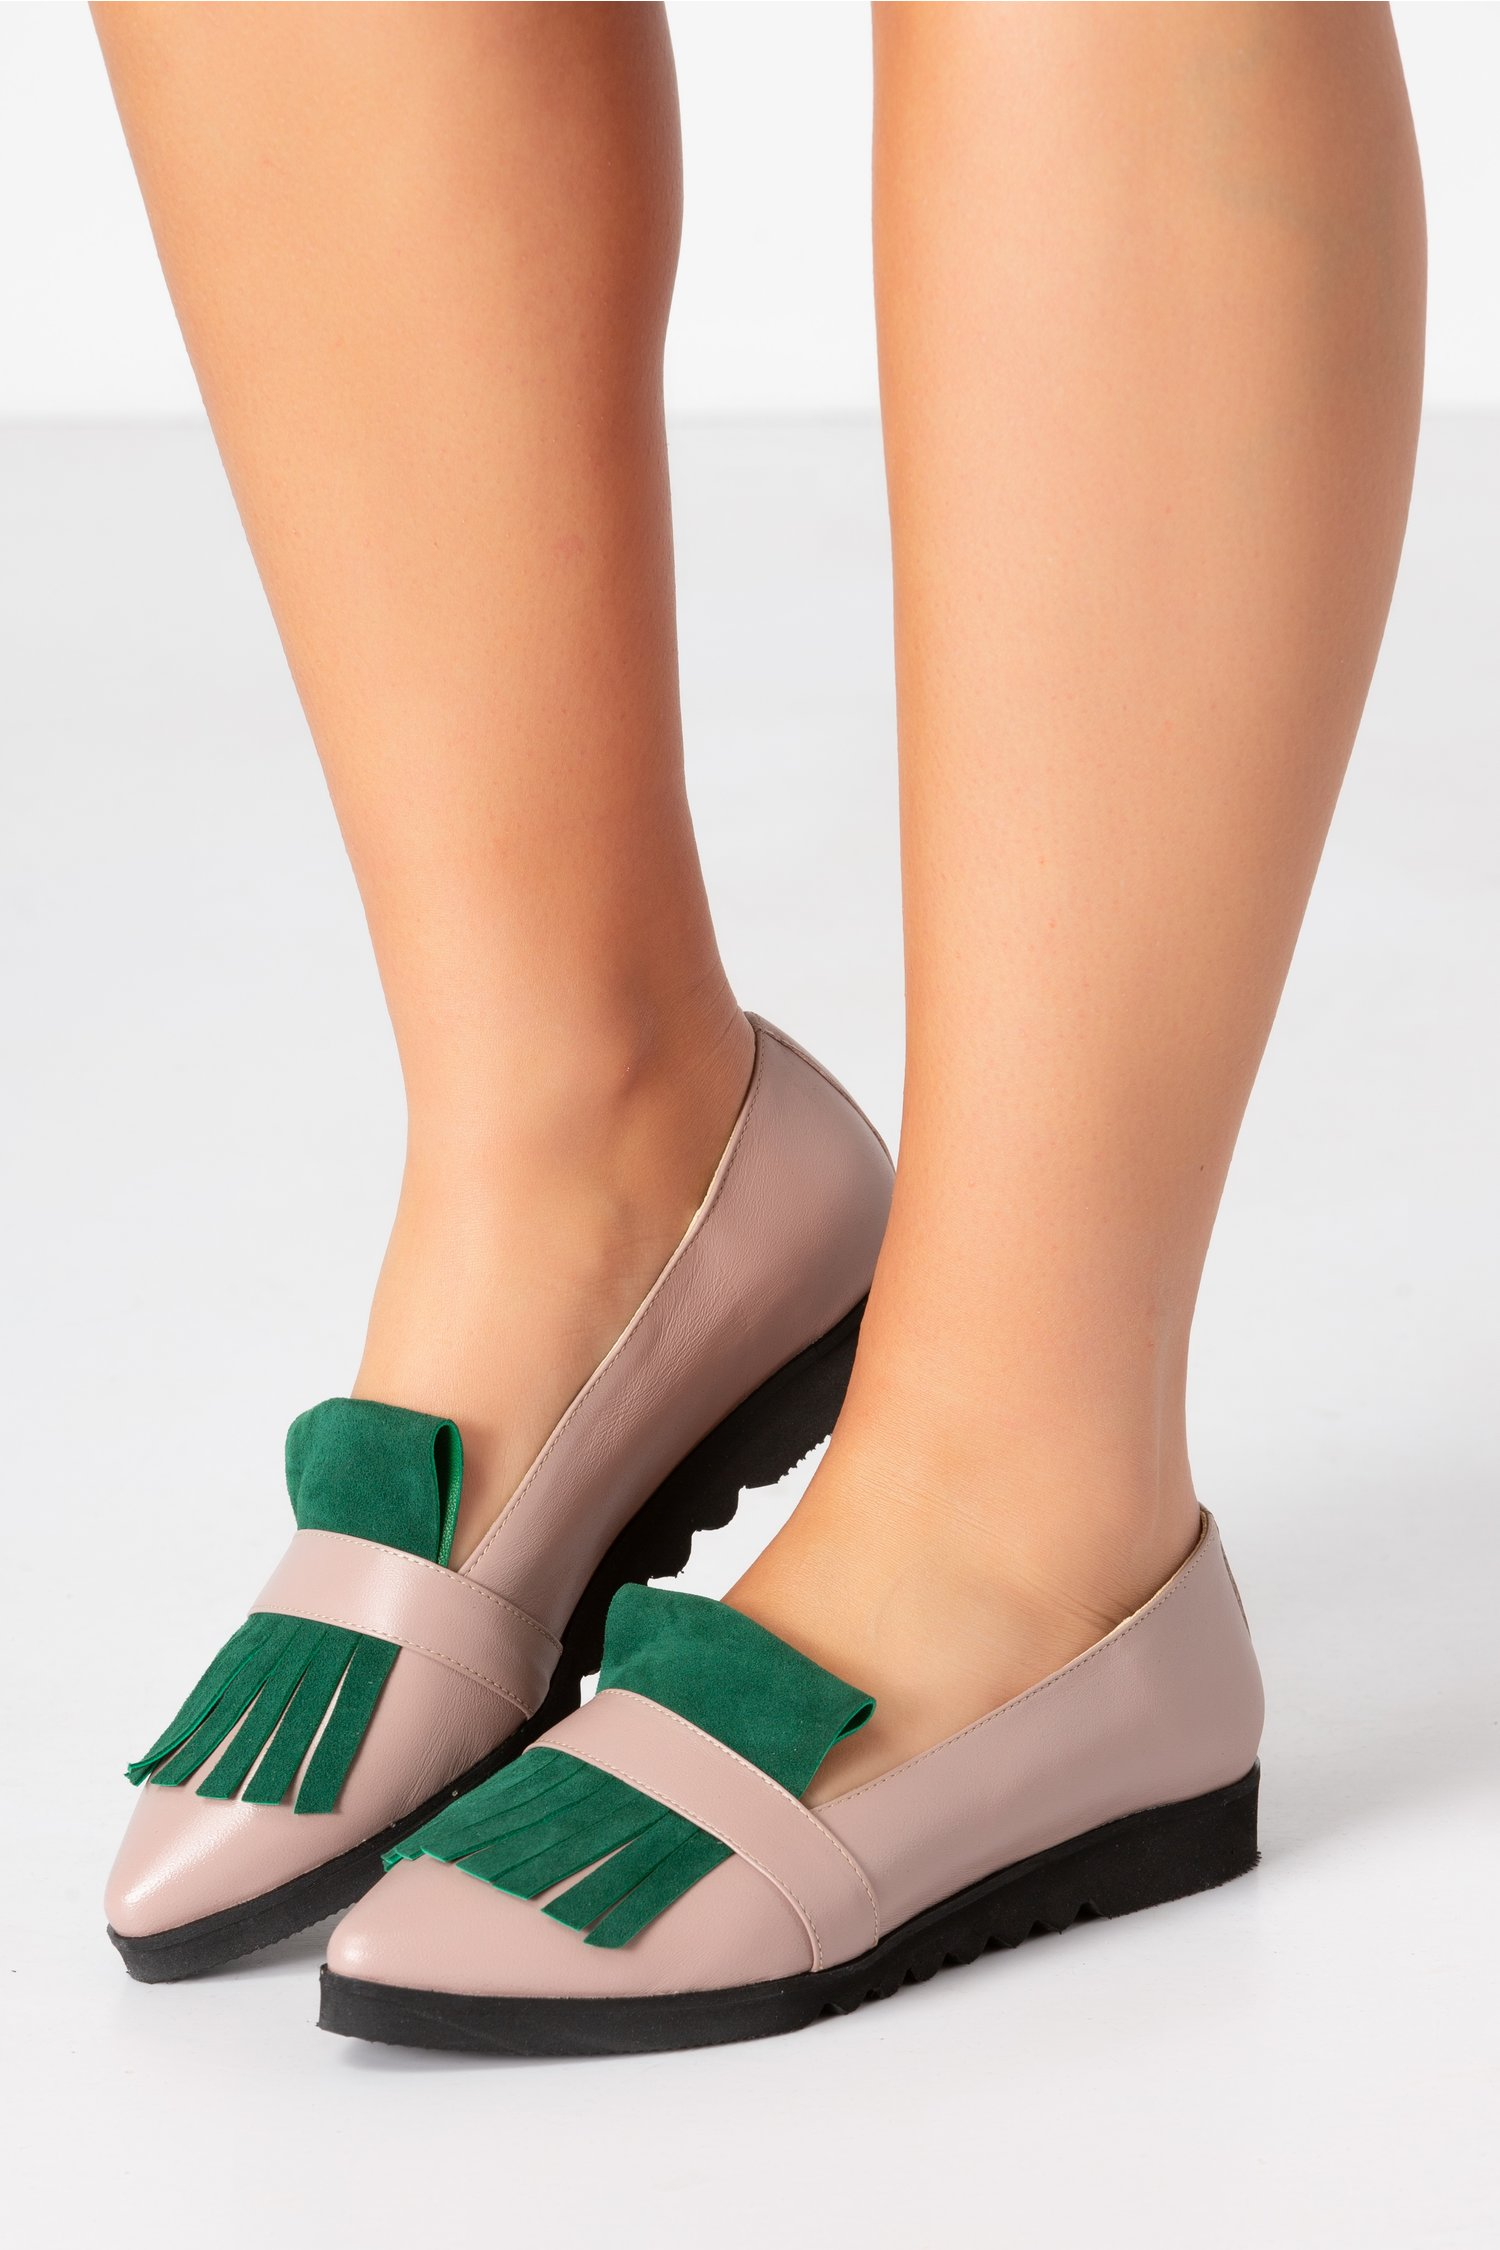 Pantofi crem cu talpa joasa si franjuri verde